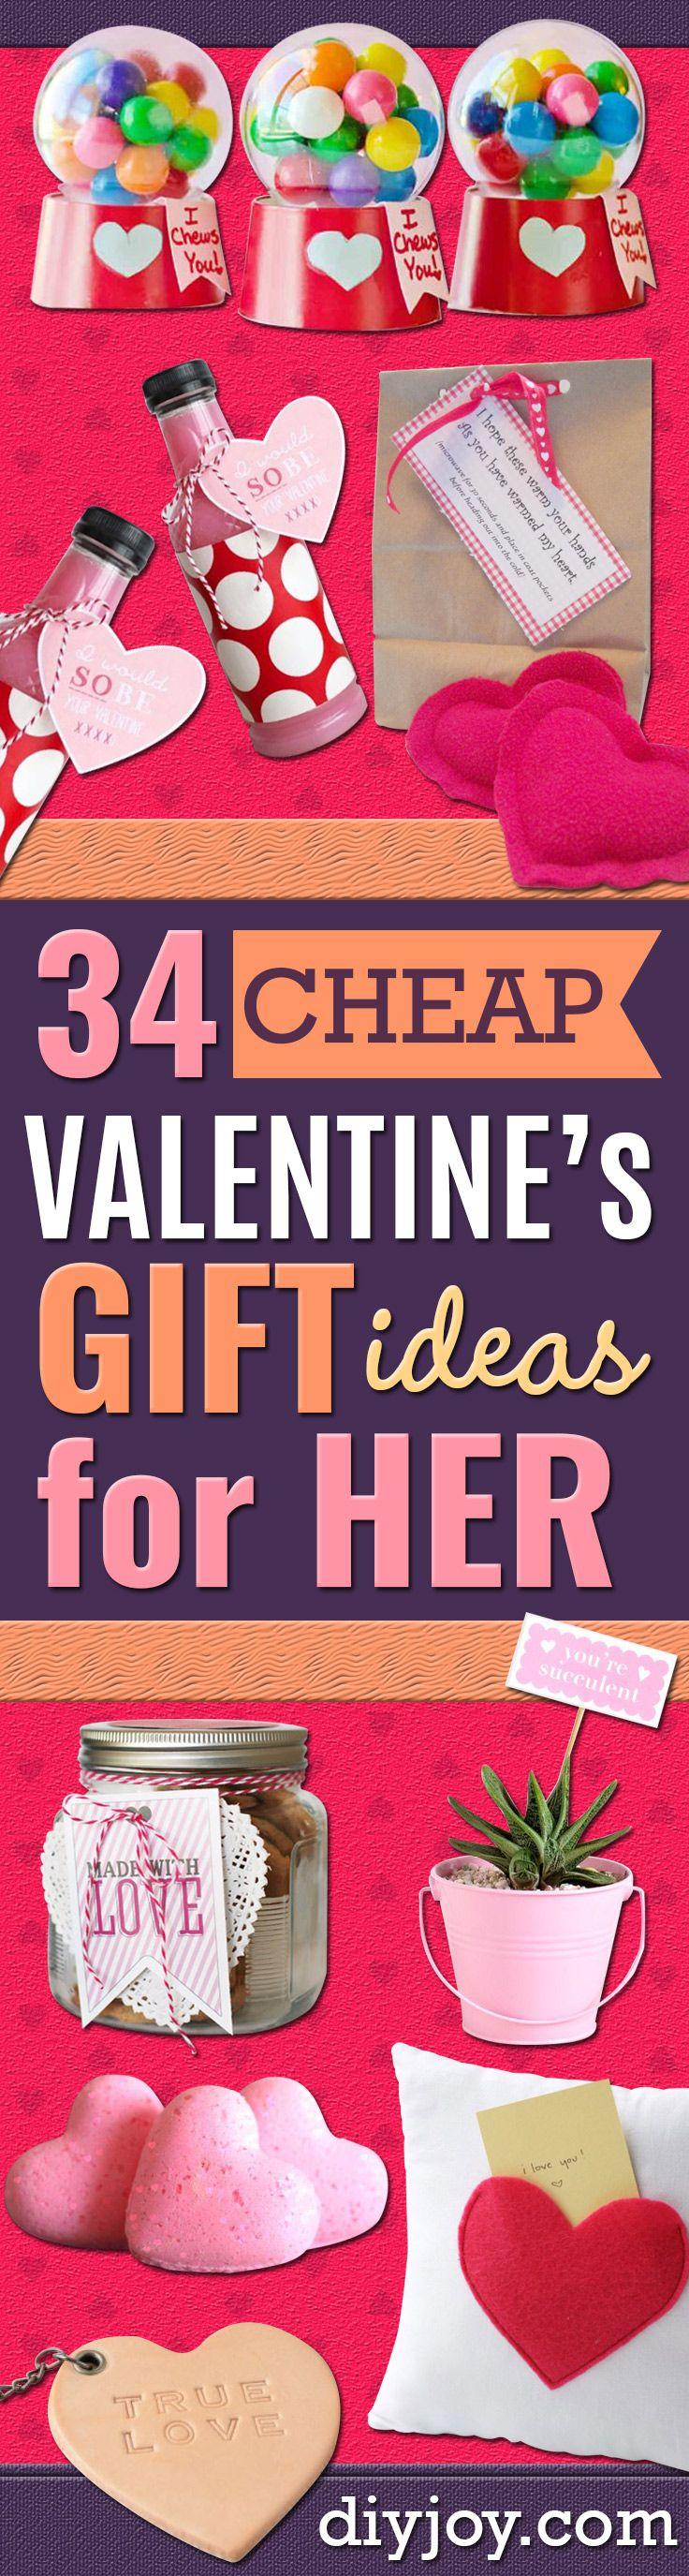 Best 25 Valentines Ideas For Her Ideas On Pinterest